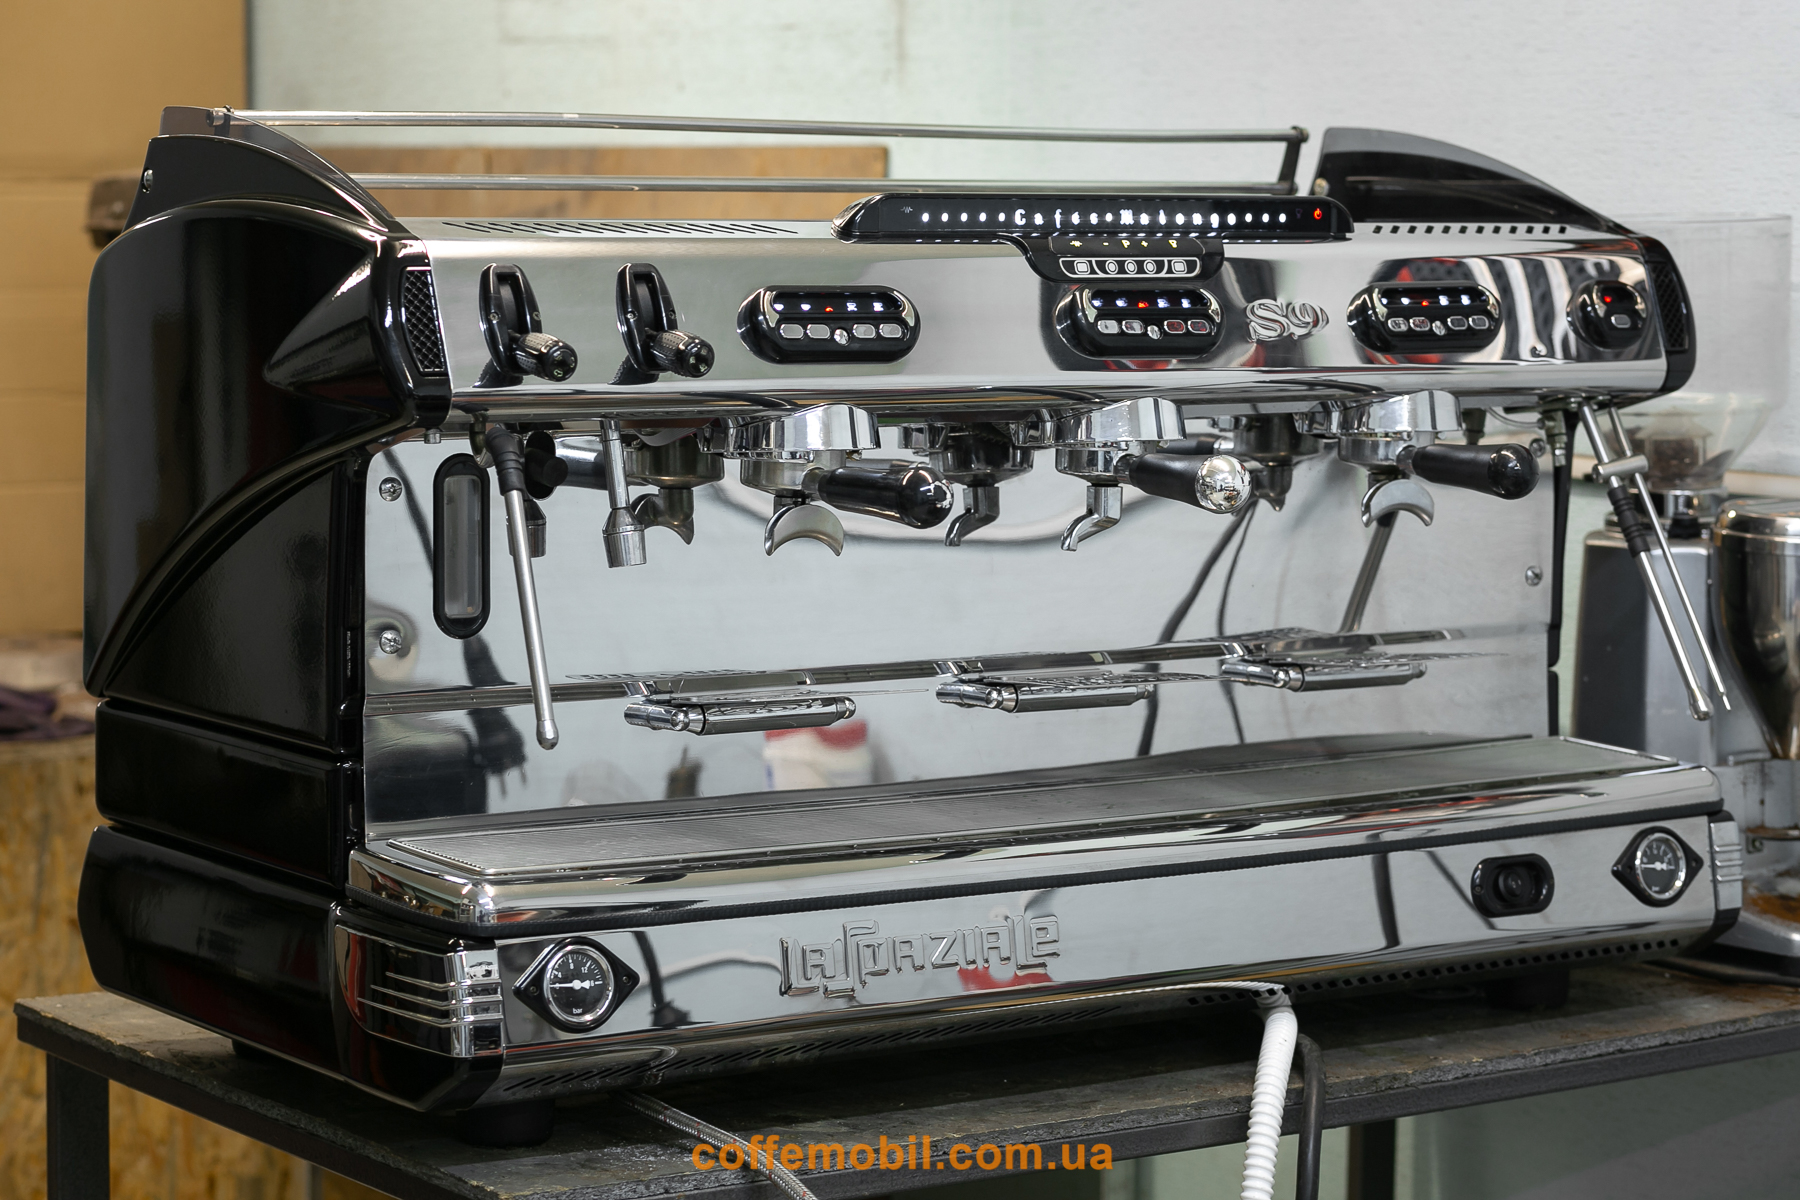 Профессиональная кофеварка Spaziale S9